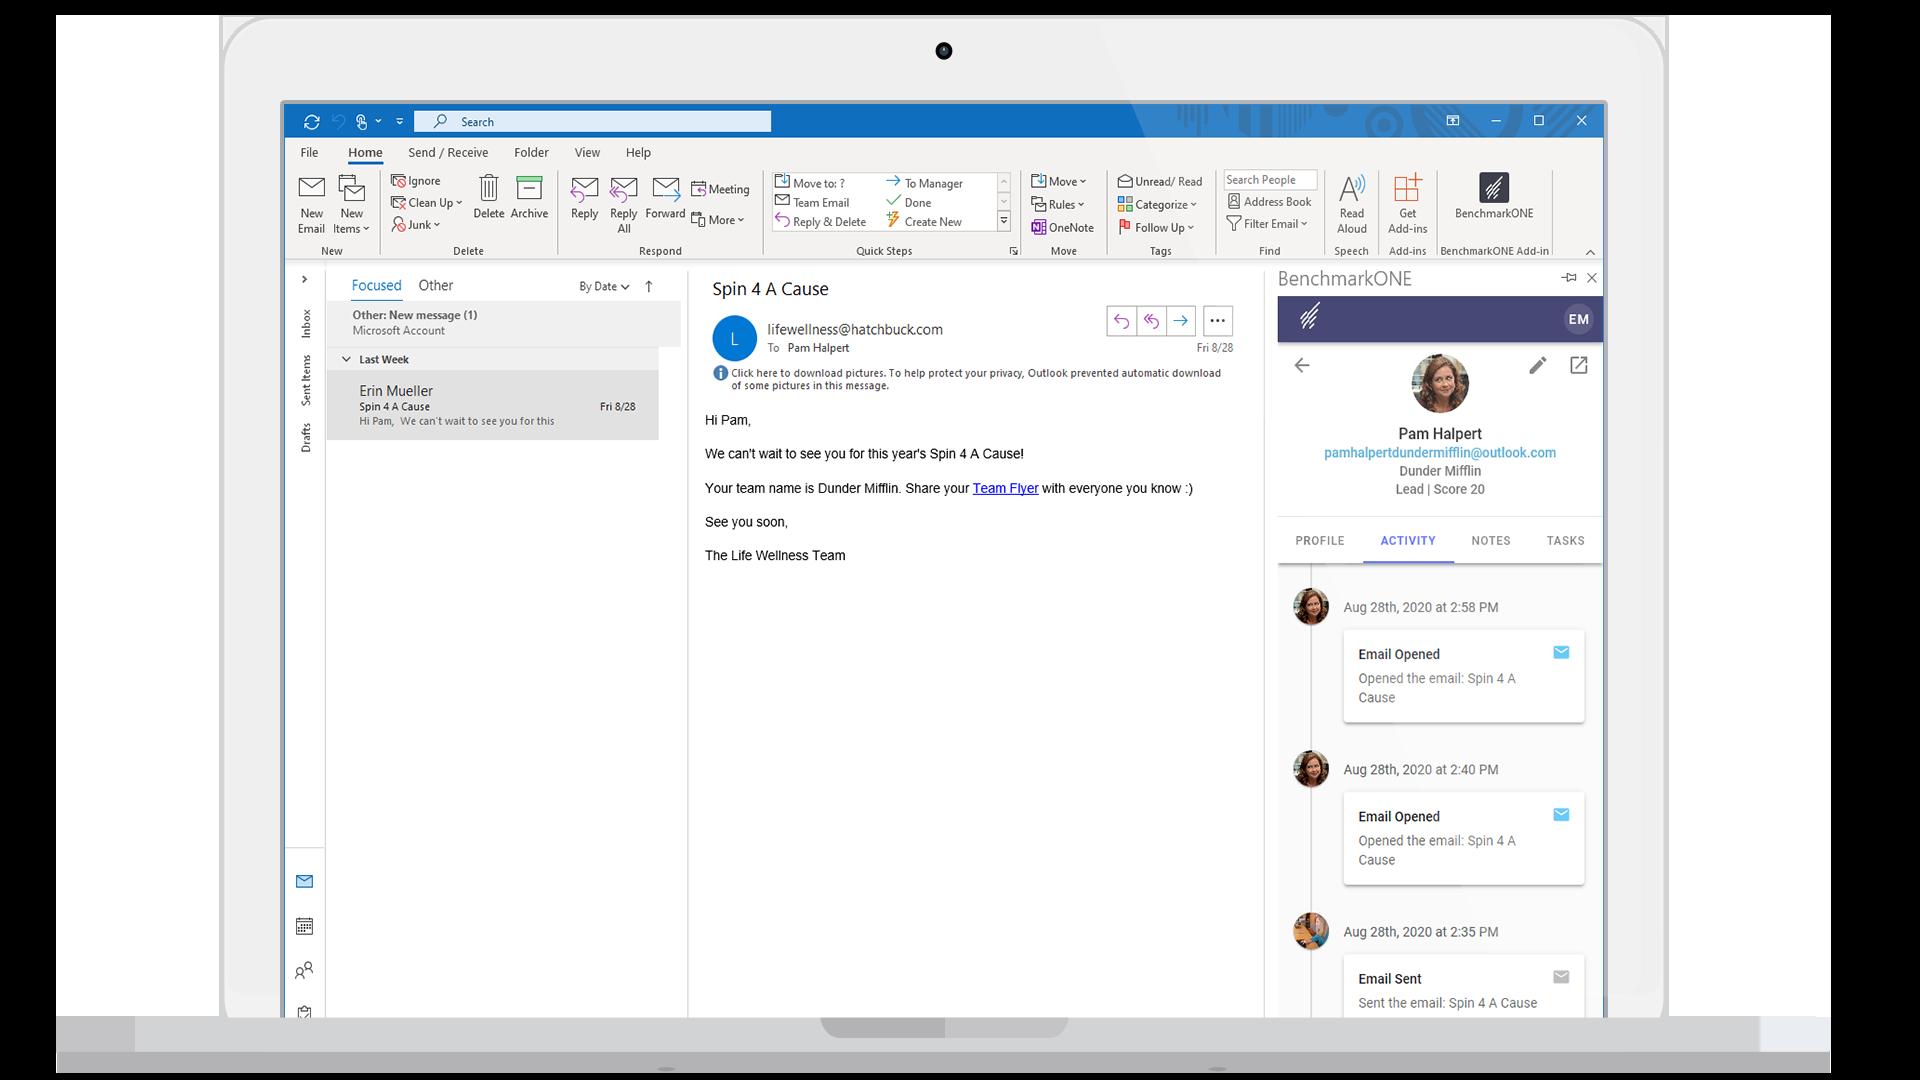 Macbook-Flat-Mockup-Outlook